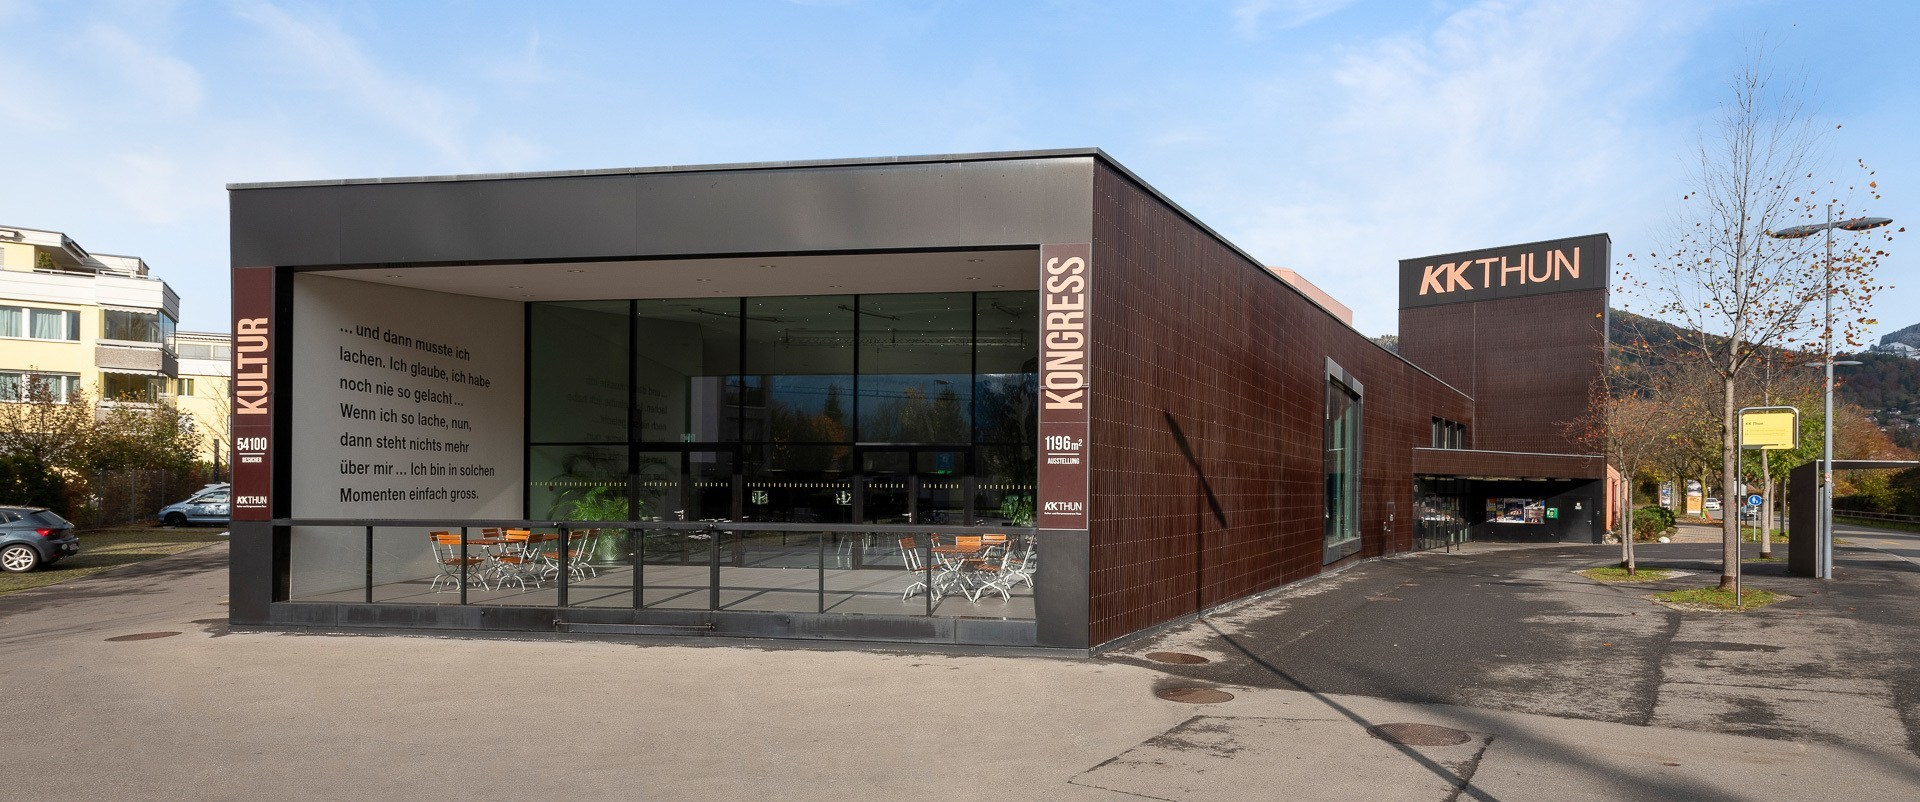 FAQ - Kultur- und Kongresszentrum Thun